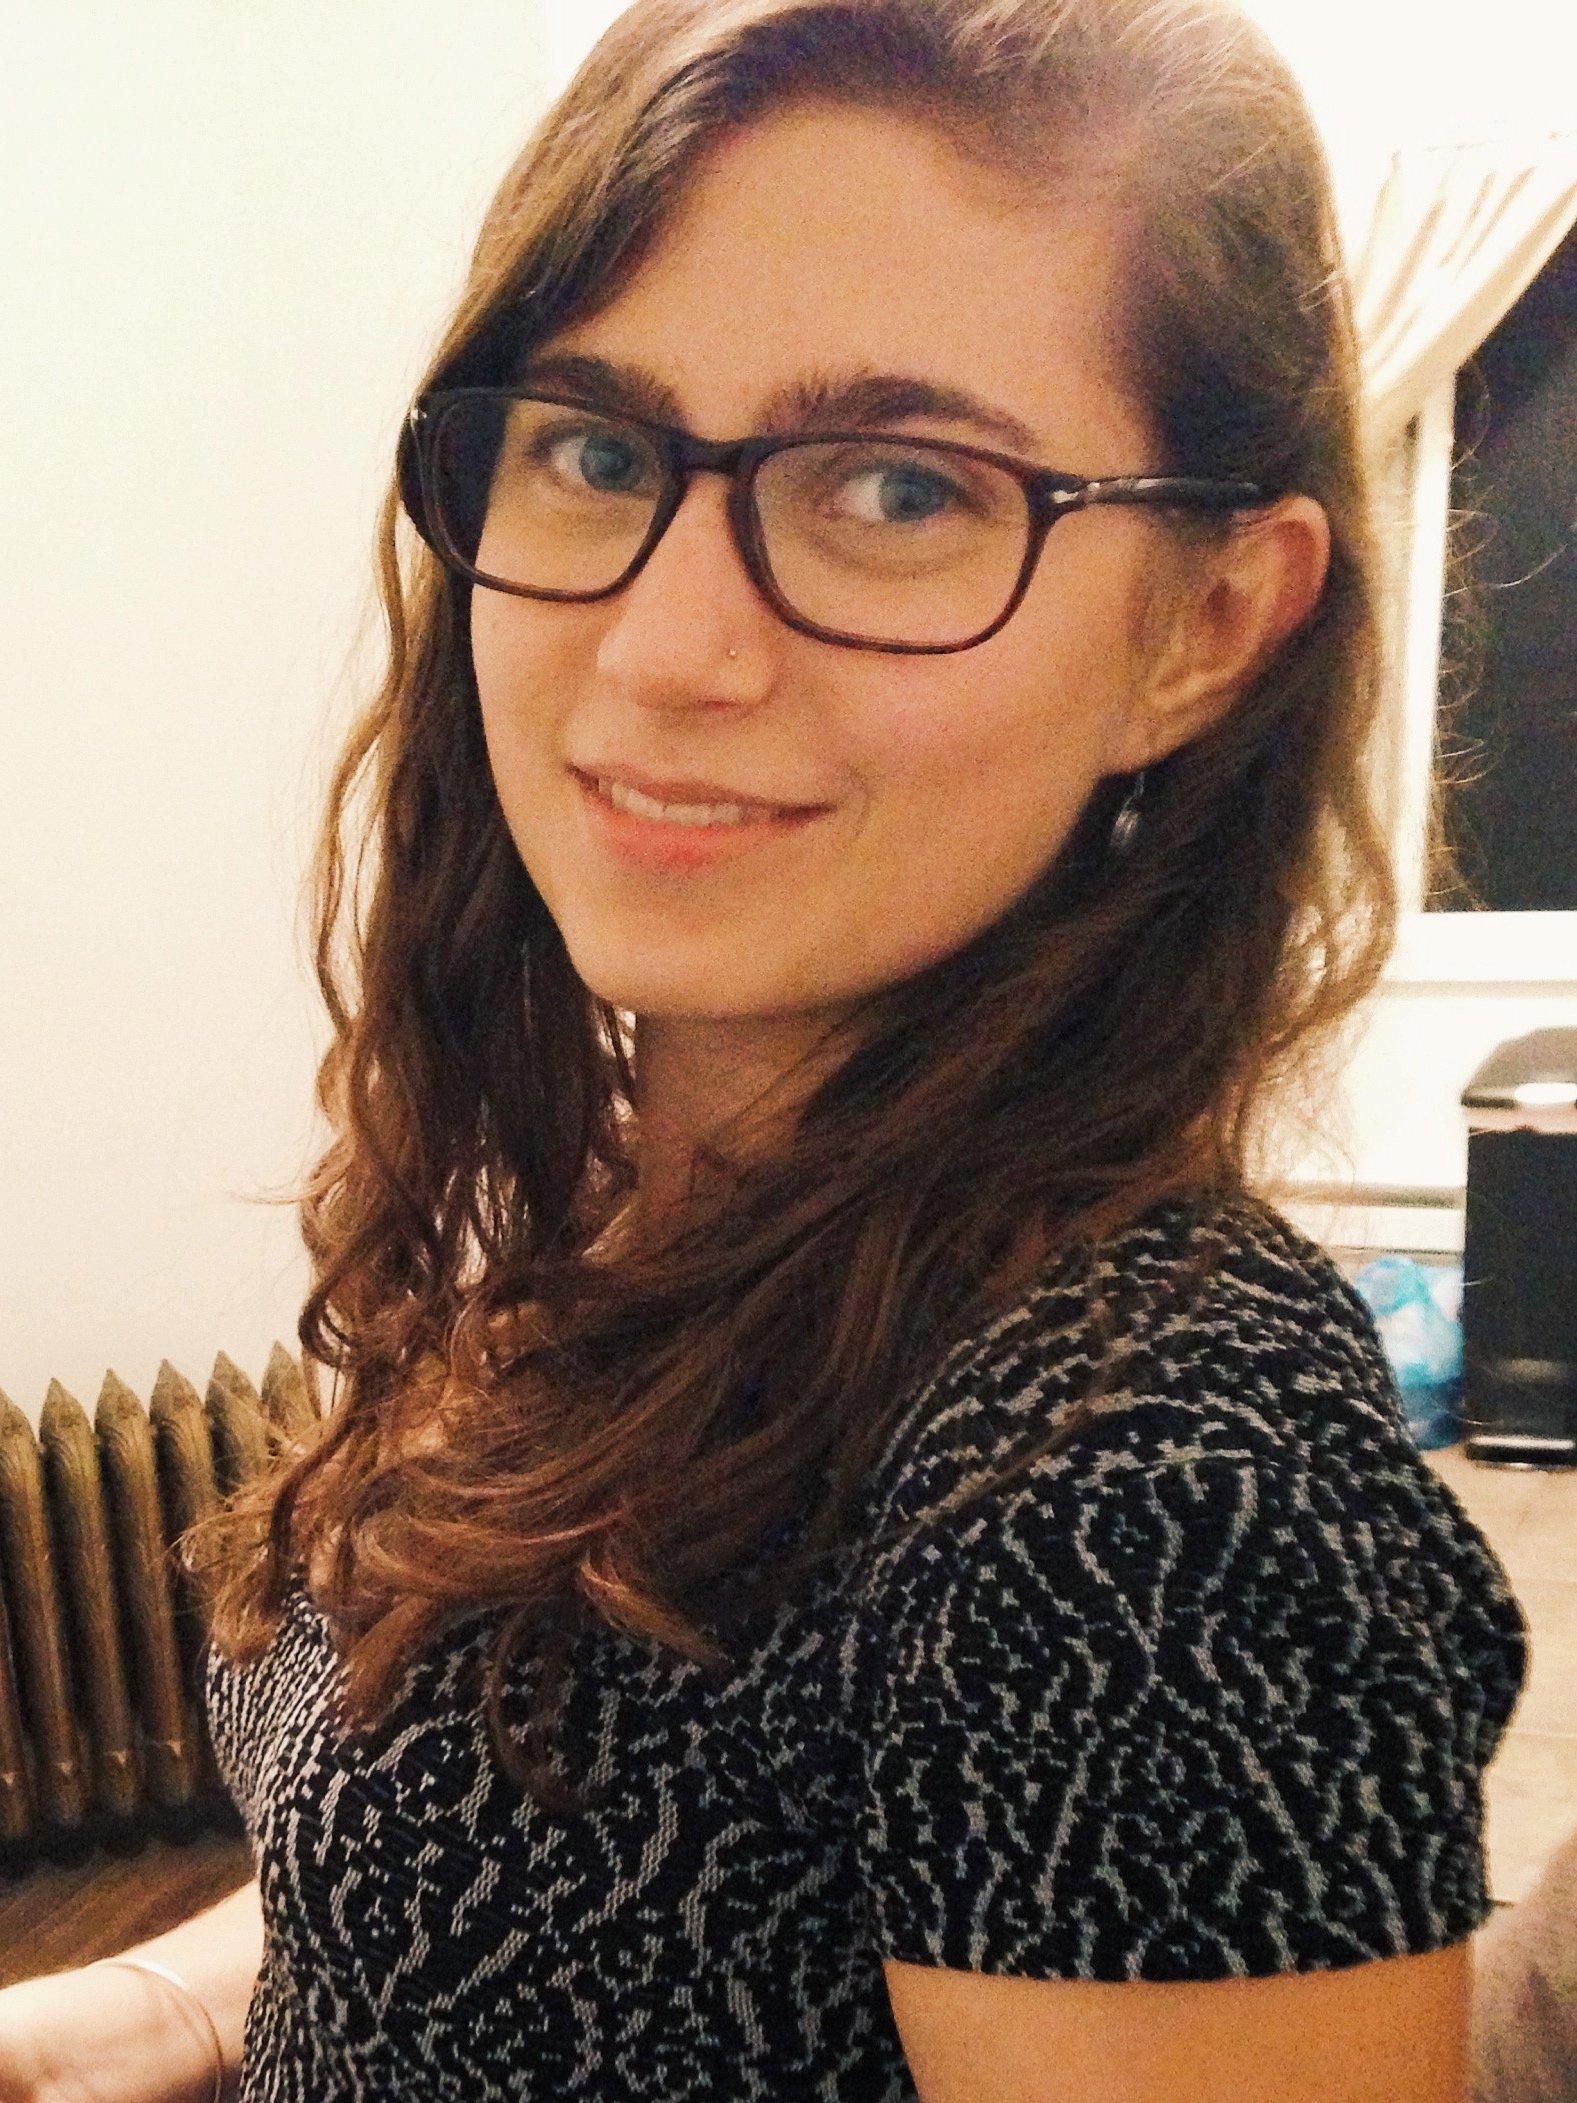 Abigail Nover (anover)